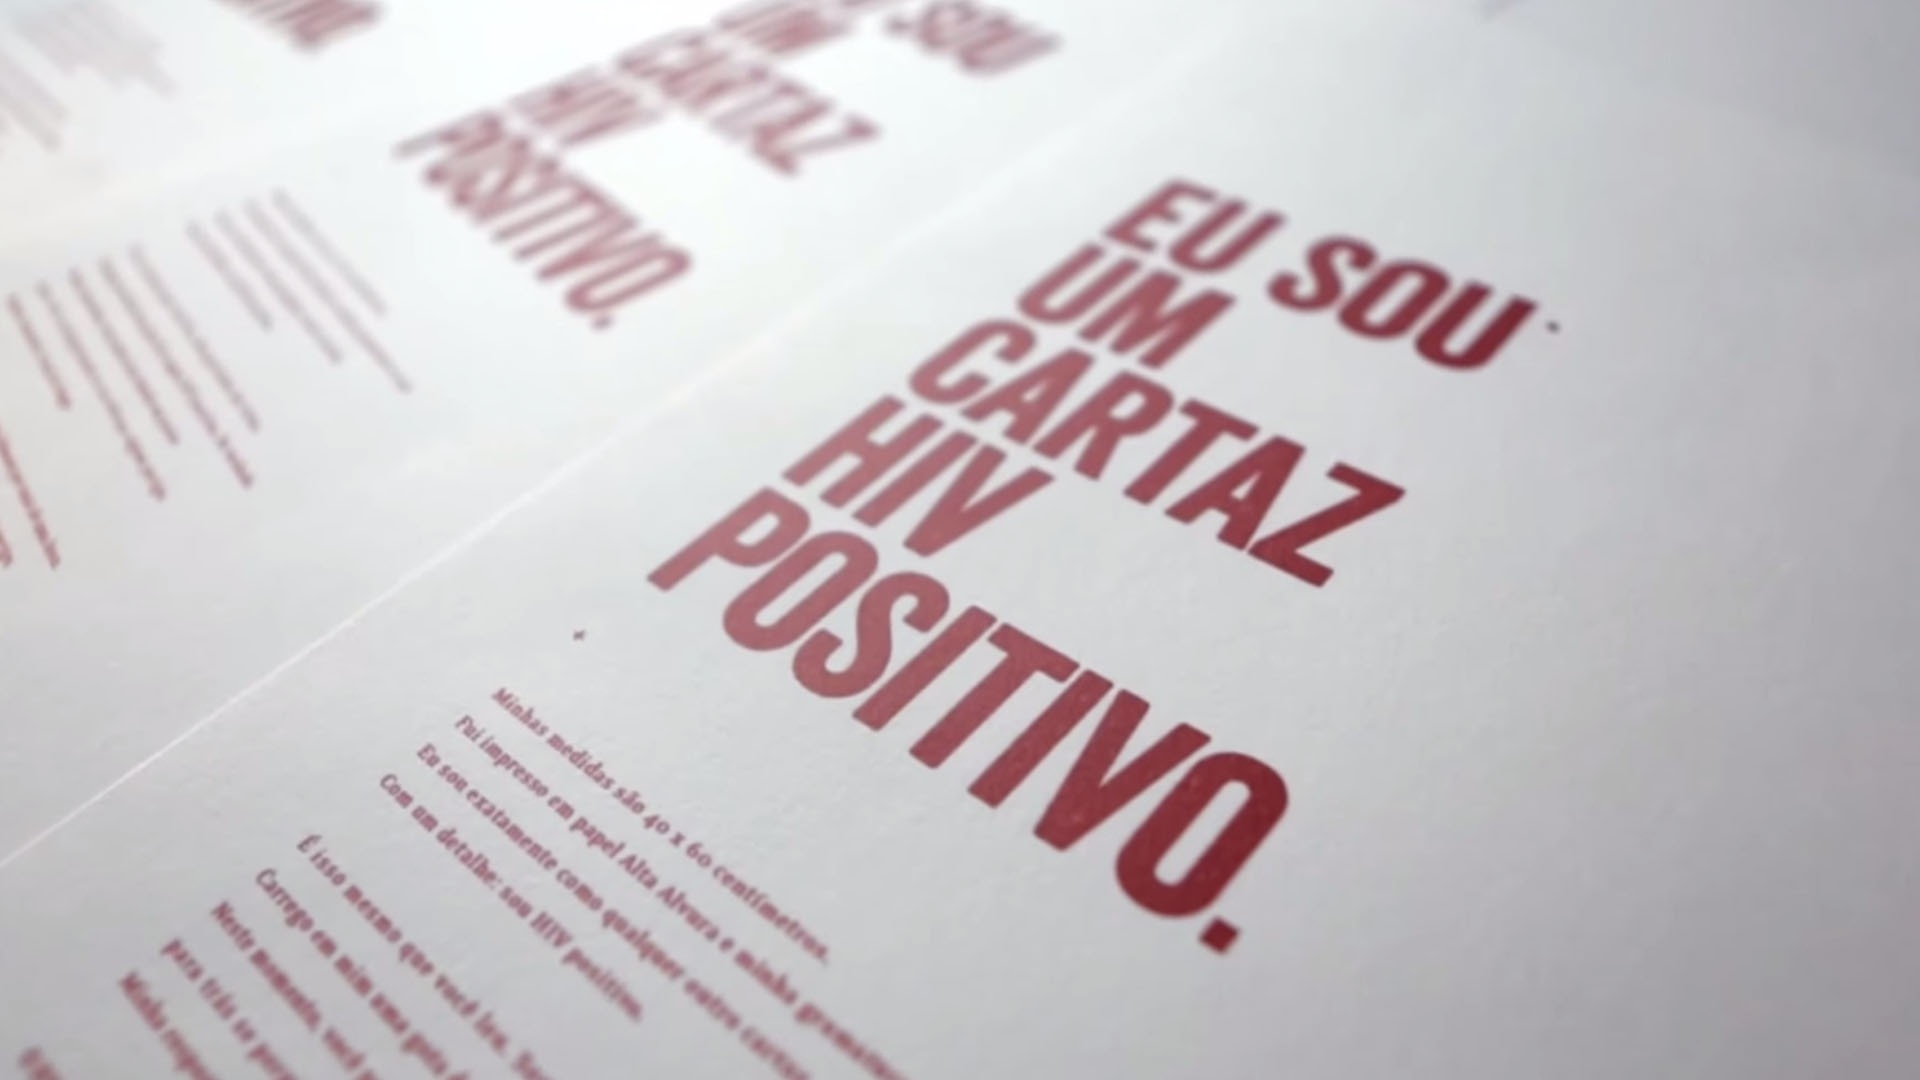 Cartaz HIV Positivo : depoimento Ozzy Cerqueira